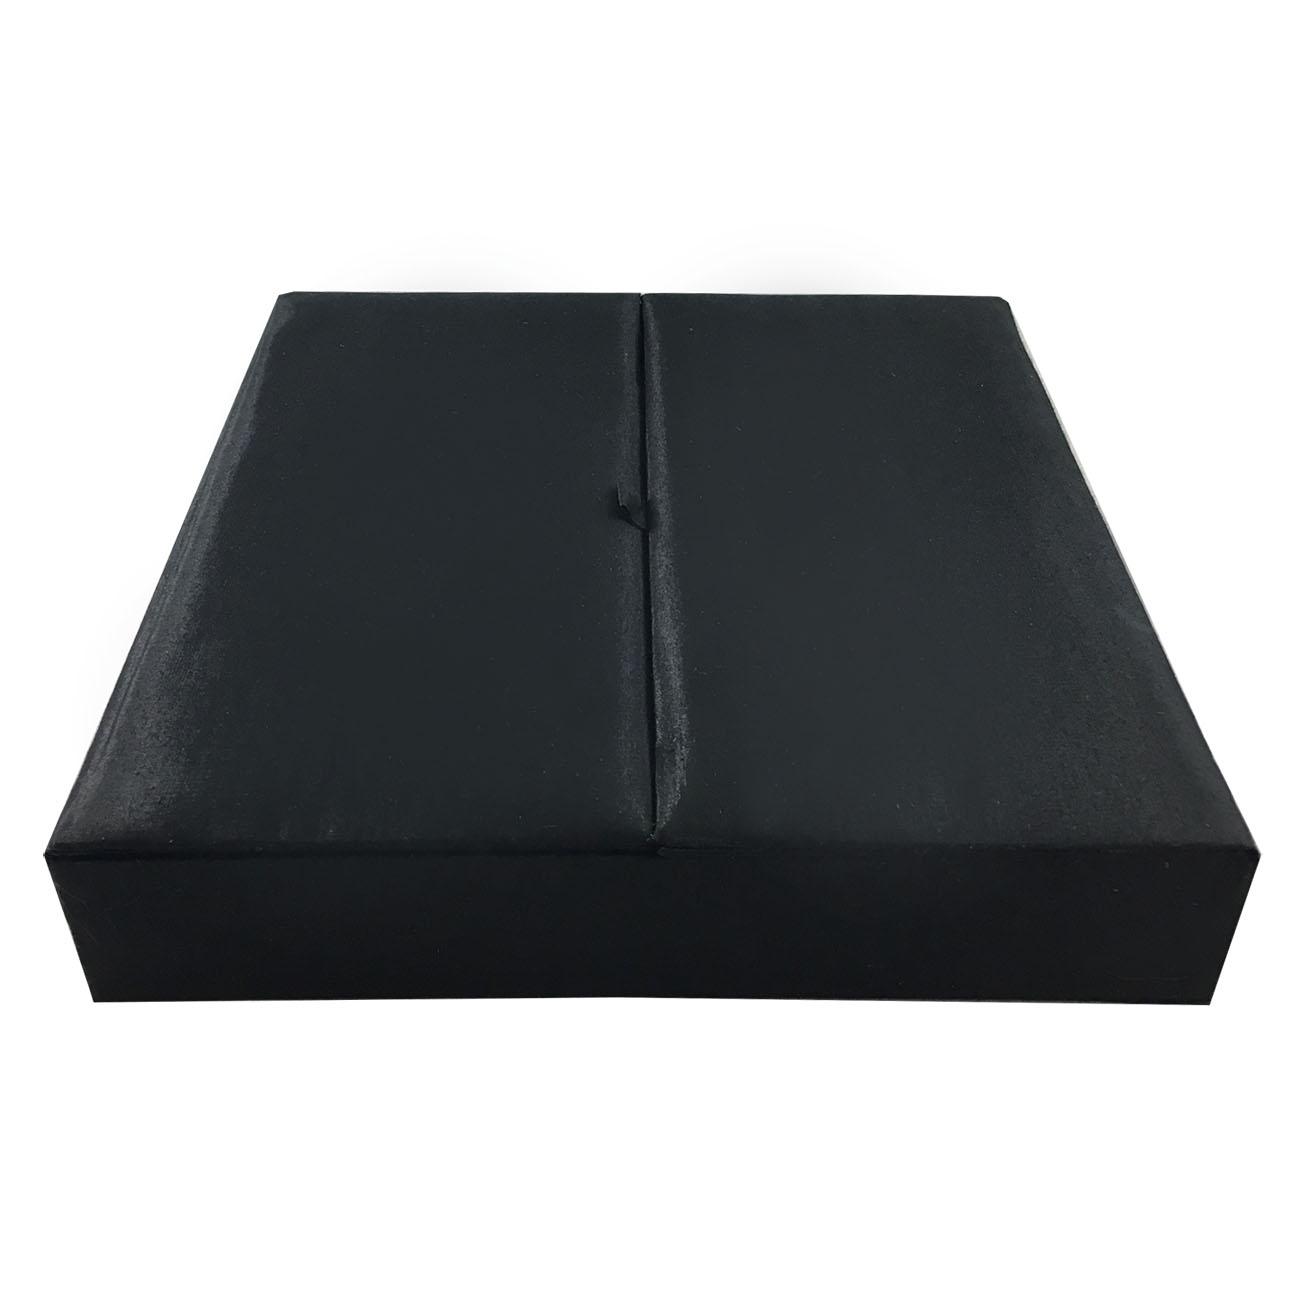 Large black funeral box